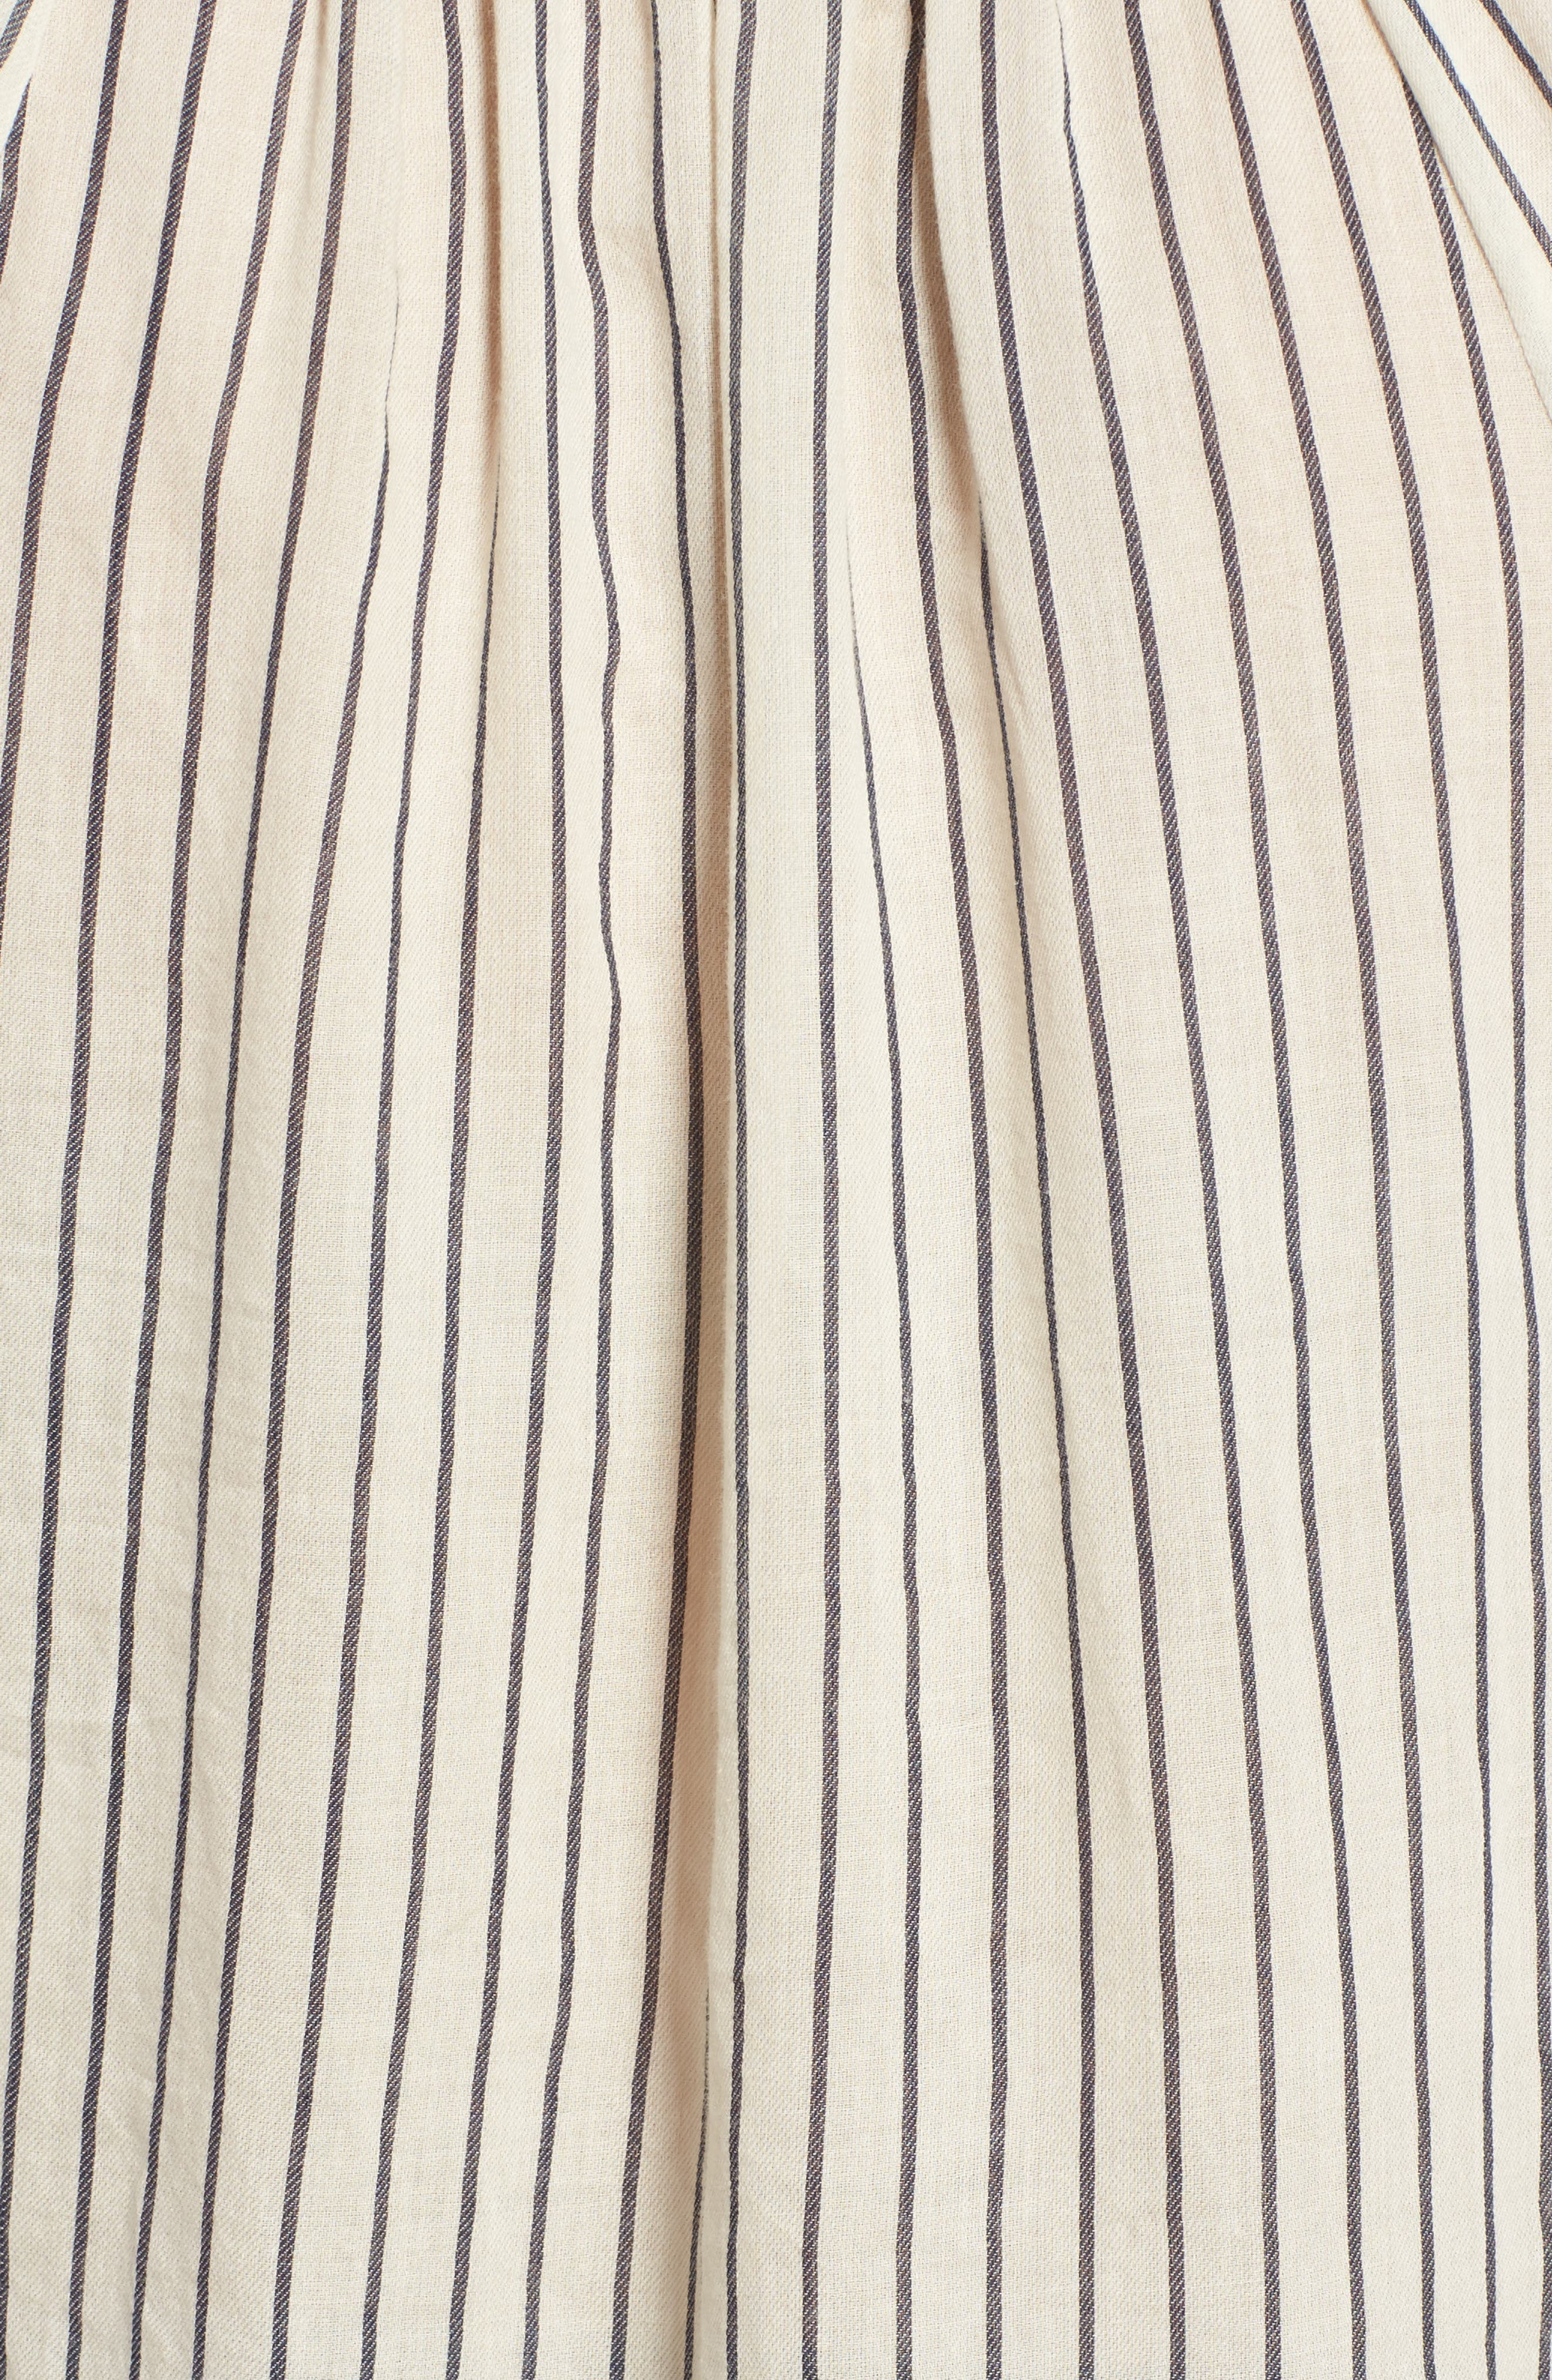 Stripe Peasant Blouse,                             Alternate thumbnail 5, color,                             006